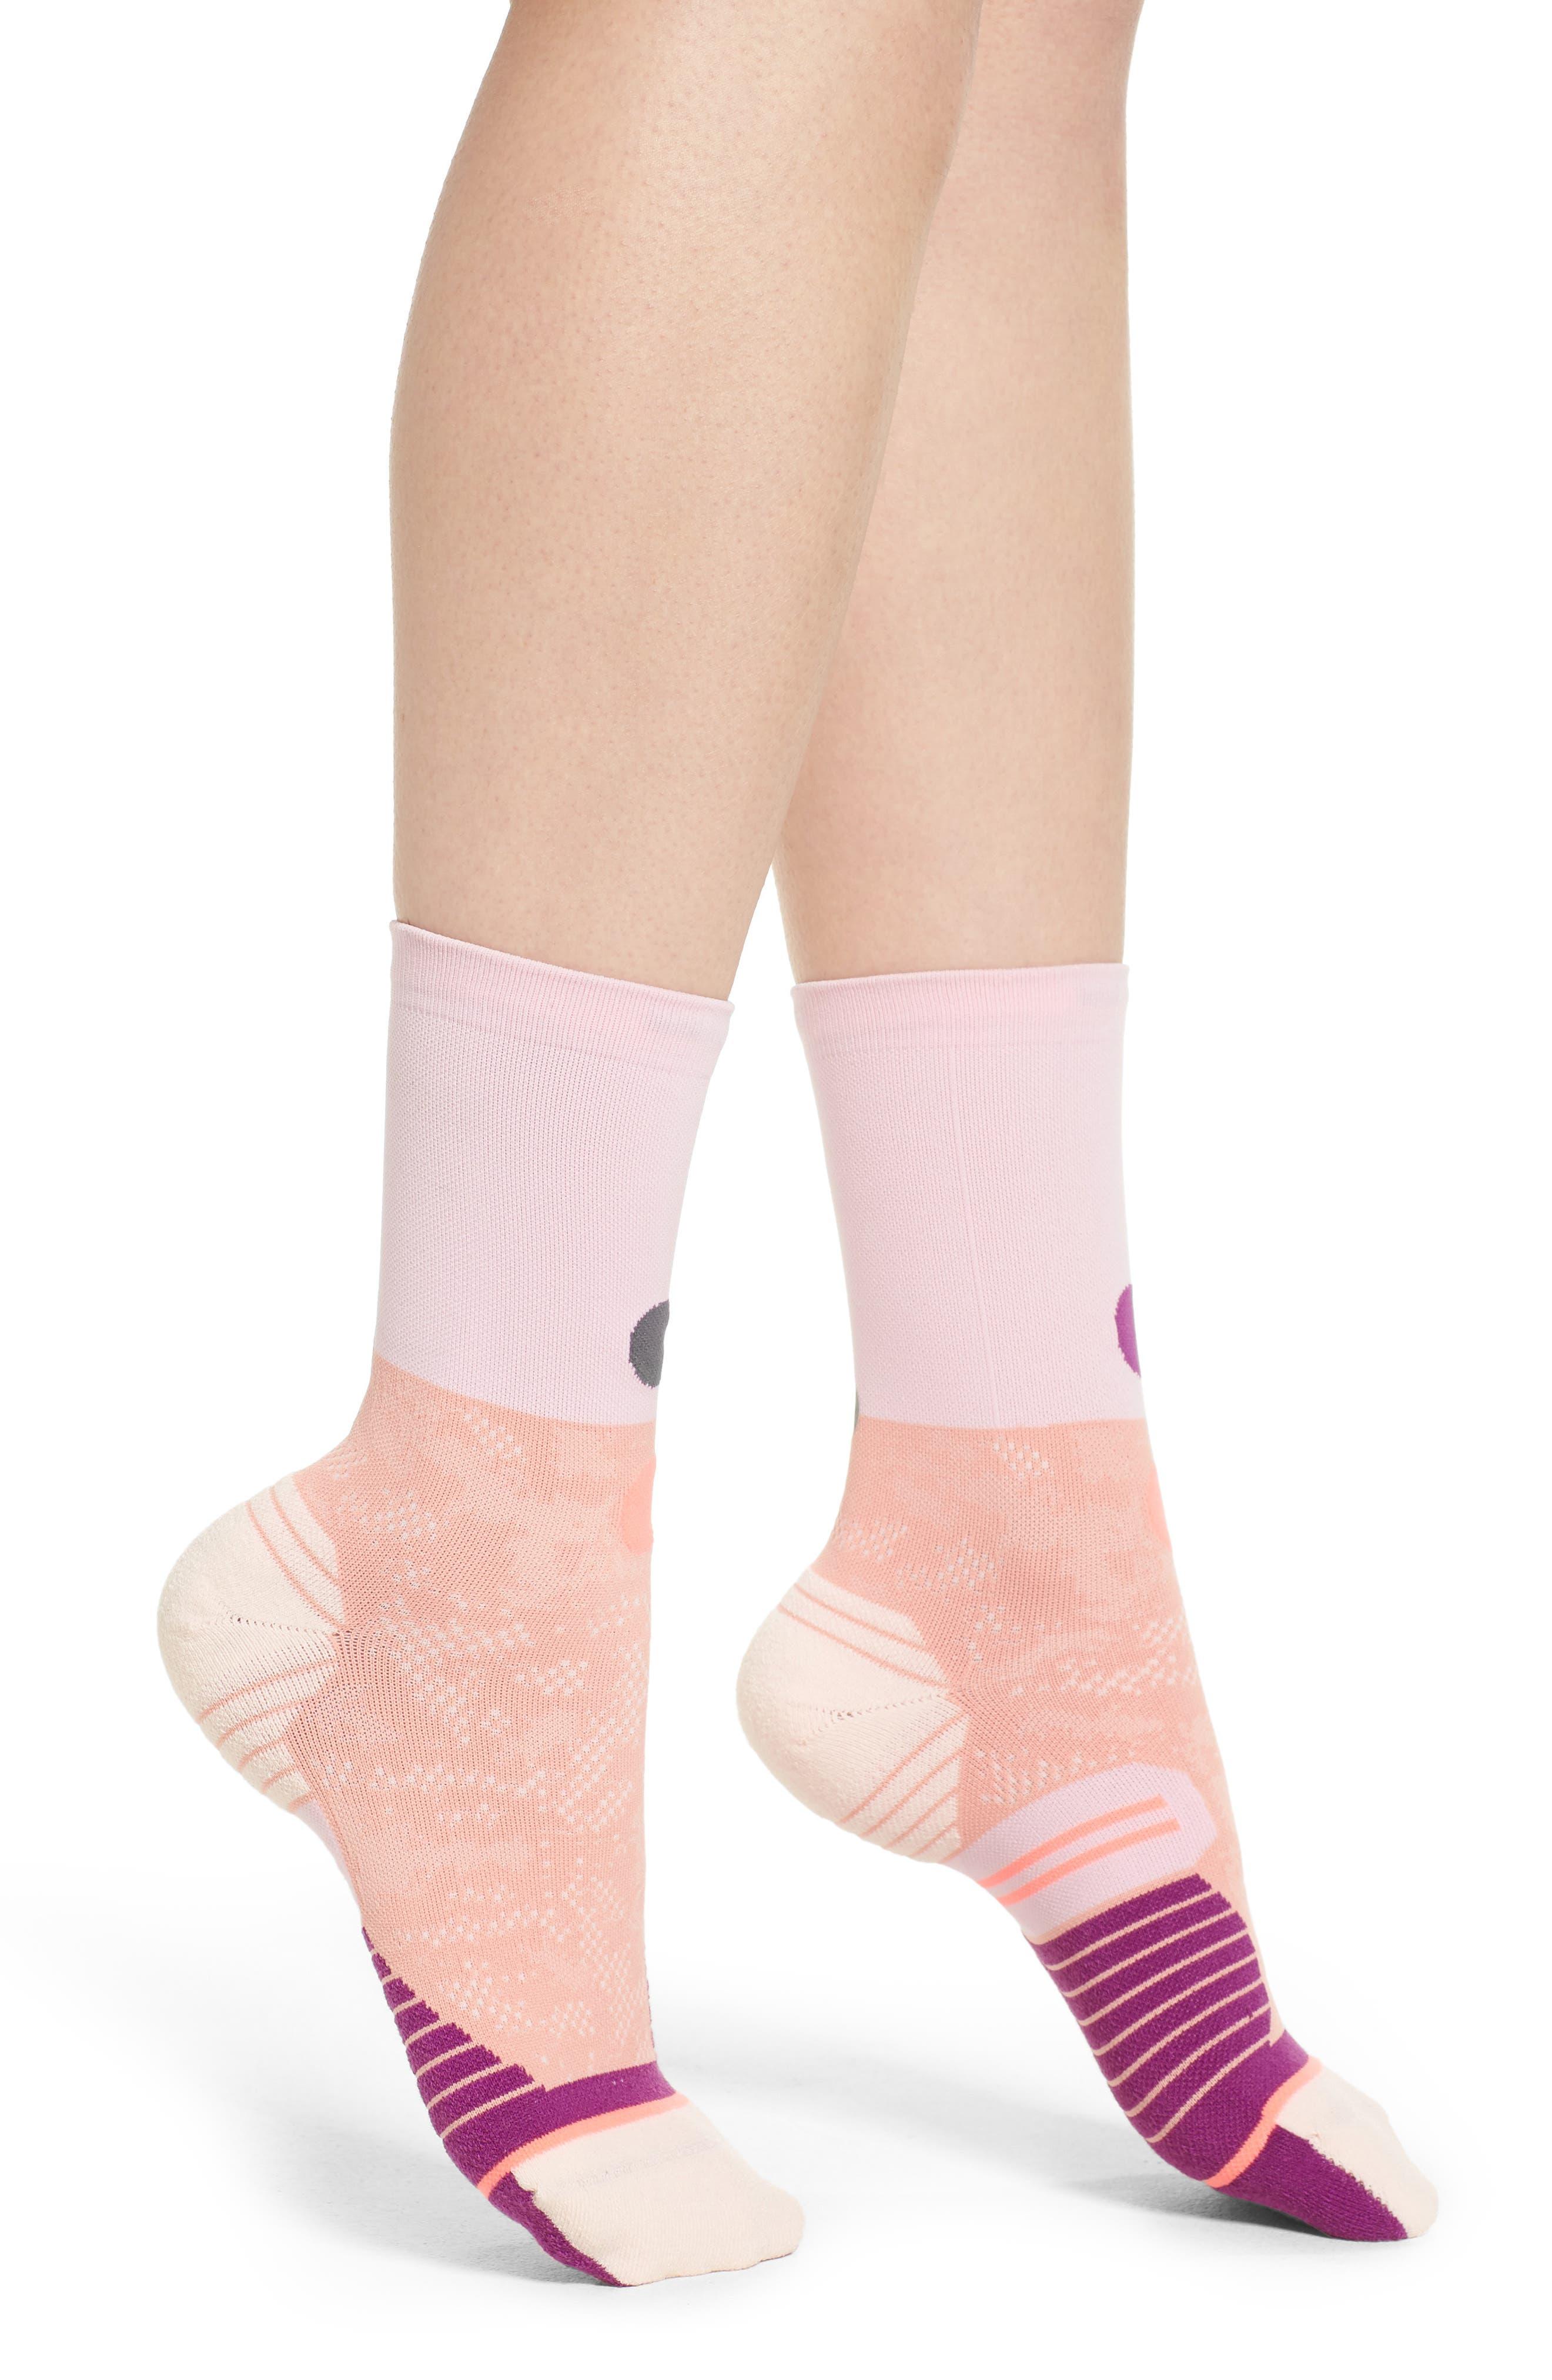 Corral Crew Running Socks,                         Main,                         color, Pink